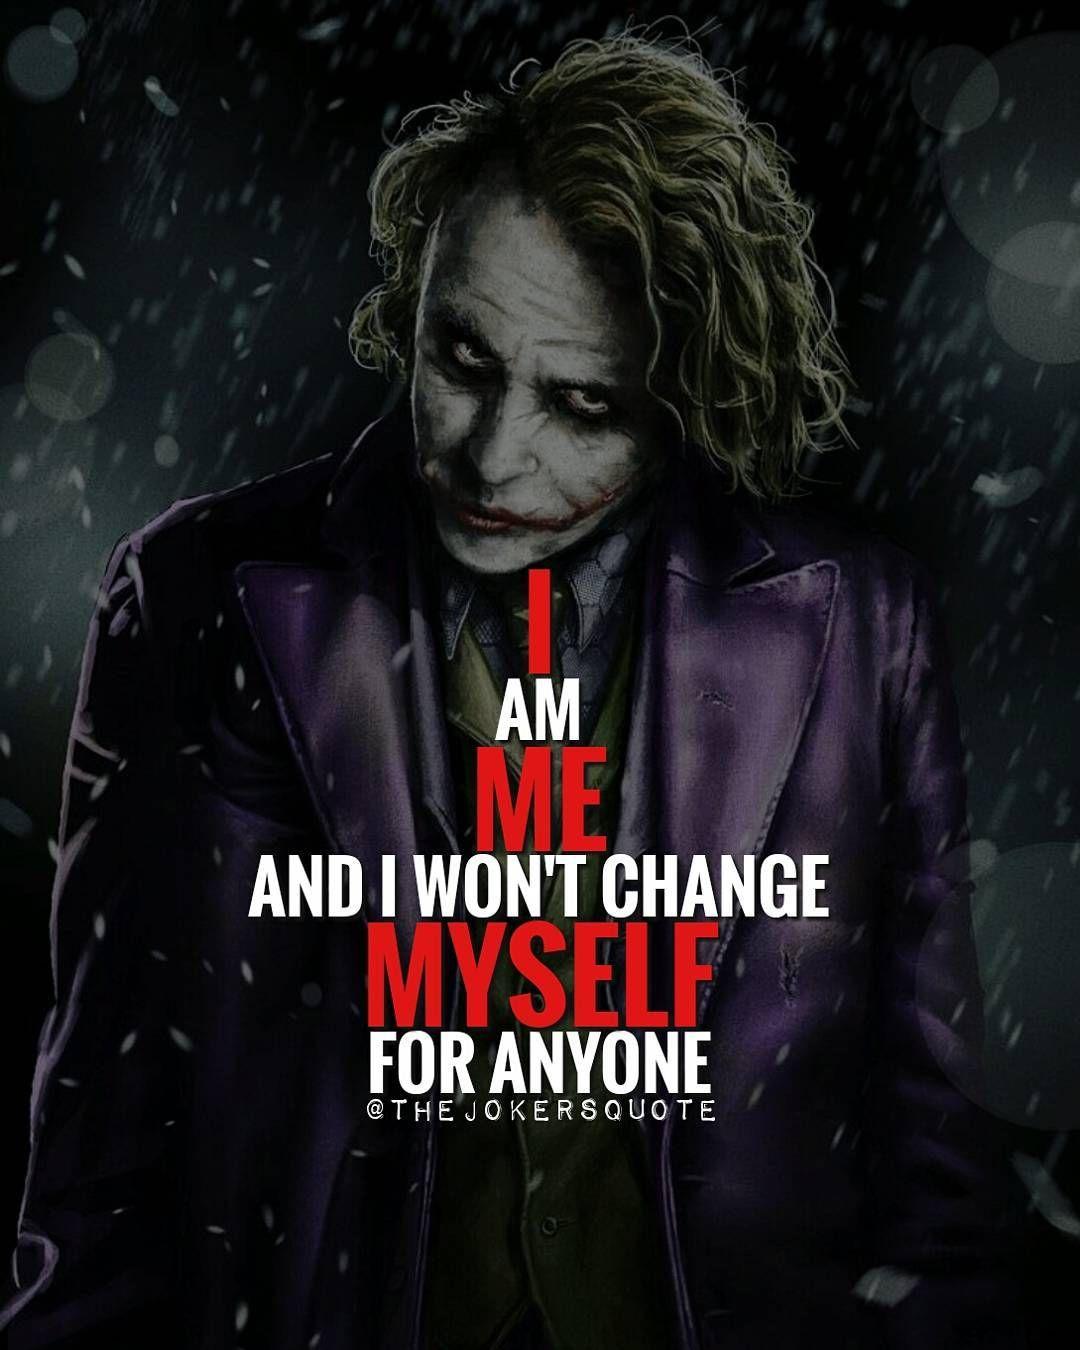 Joker Quotes Pin by Ashish Kumar on jokerrrrrr | Pinterest | Quotes, Joker  Joker Quotes